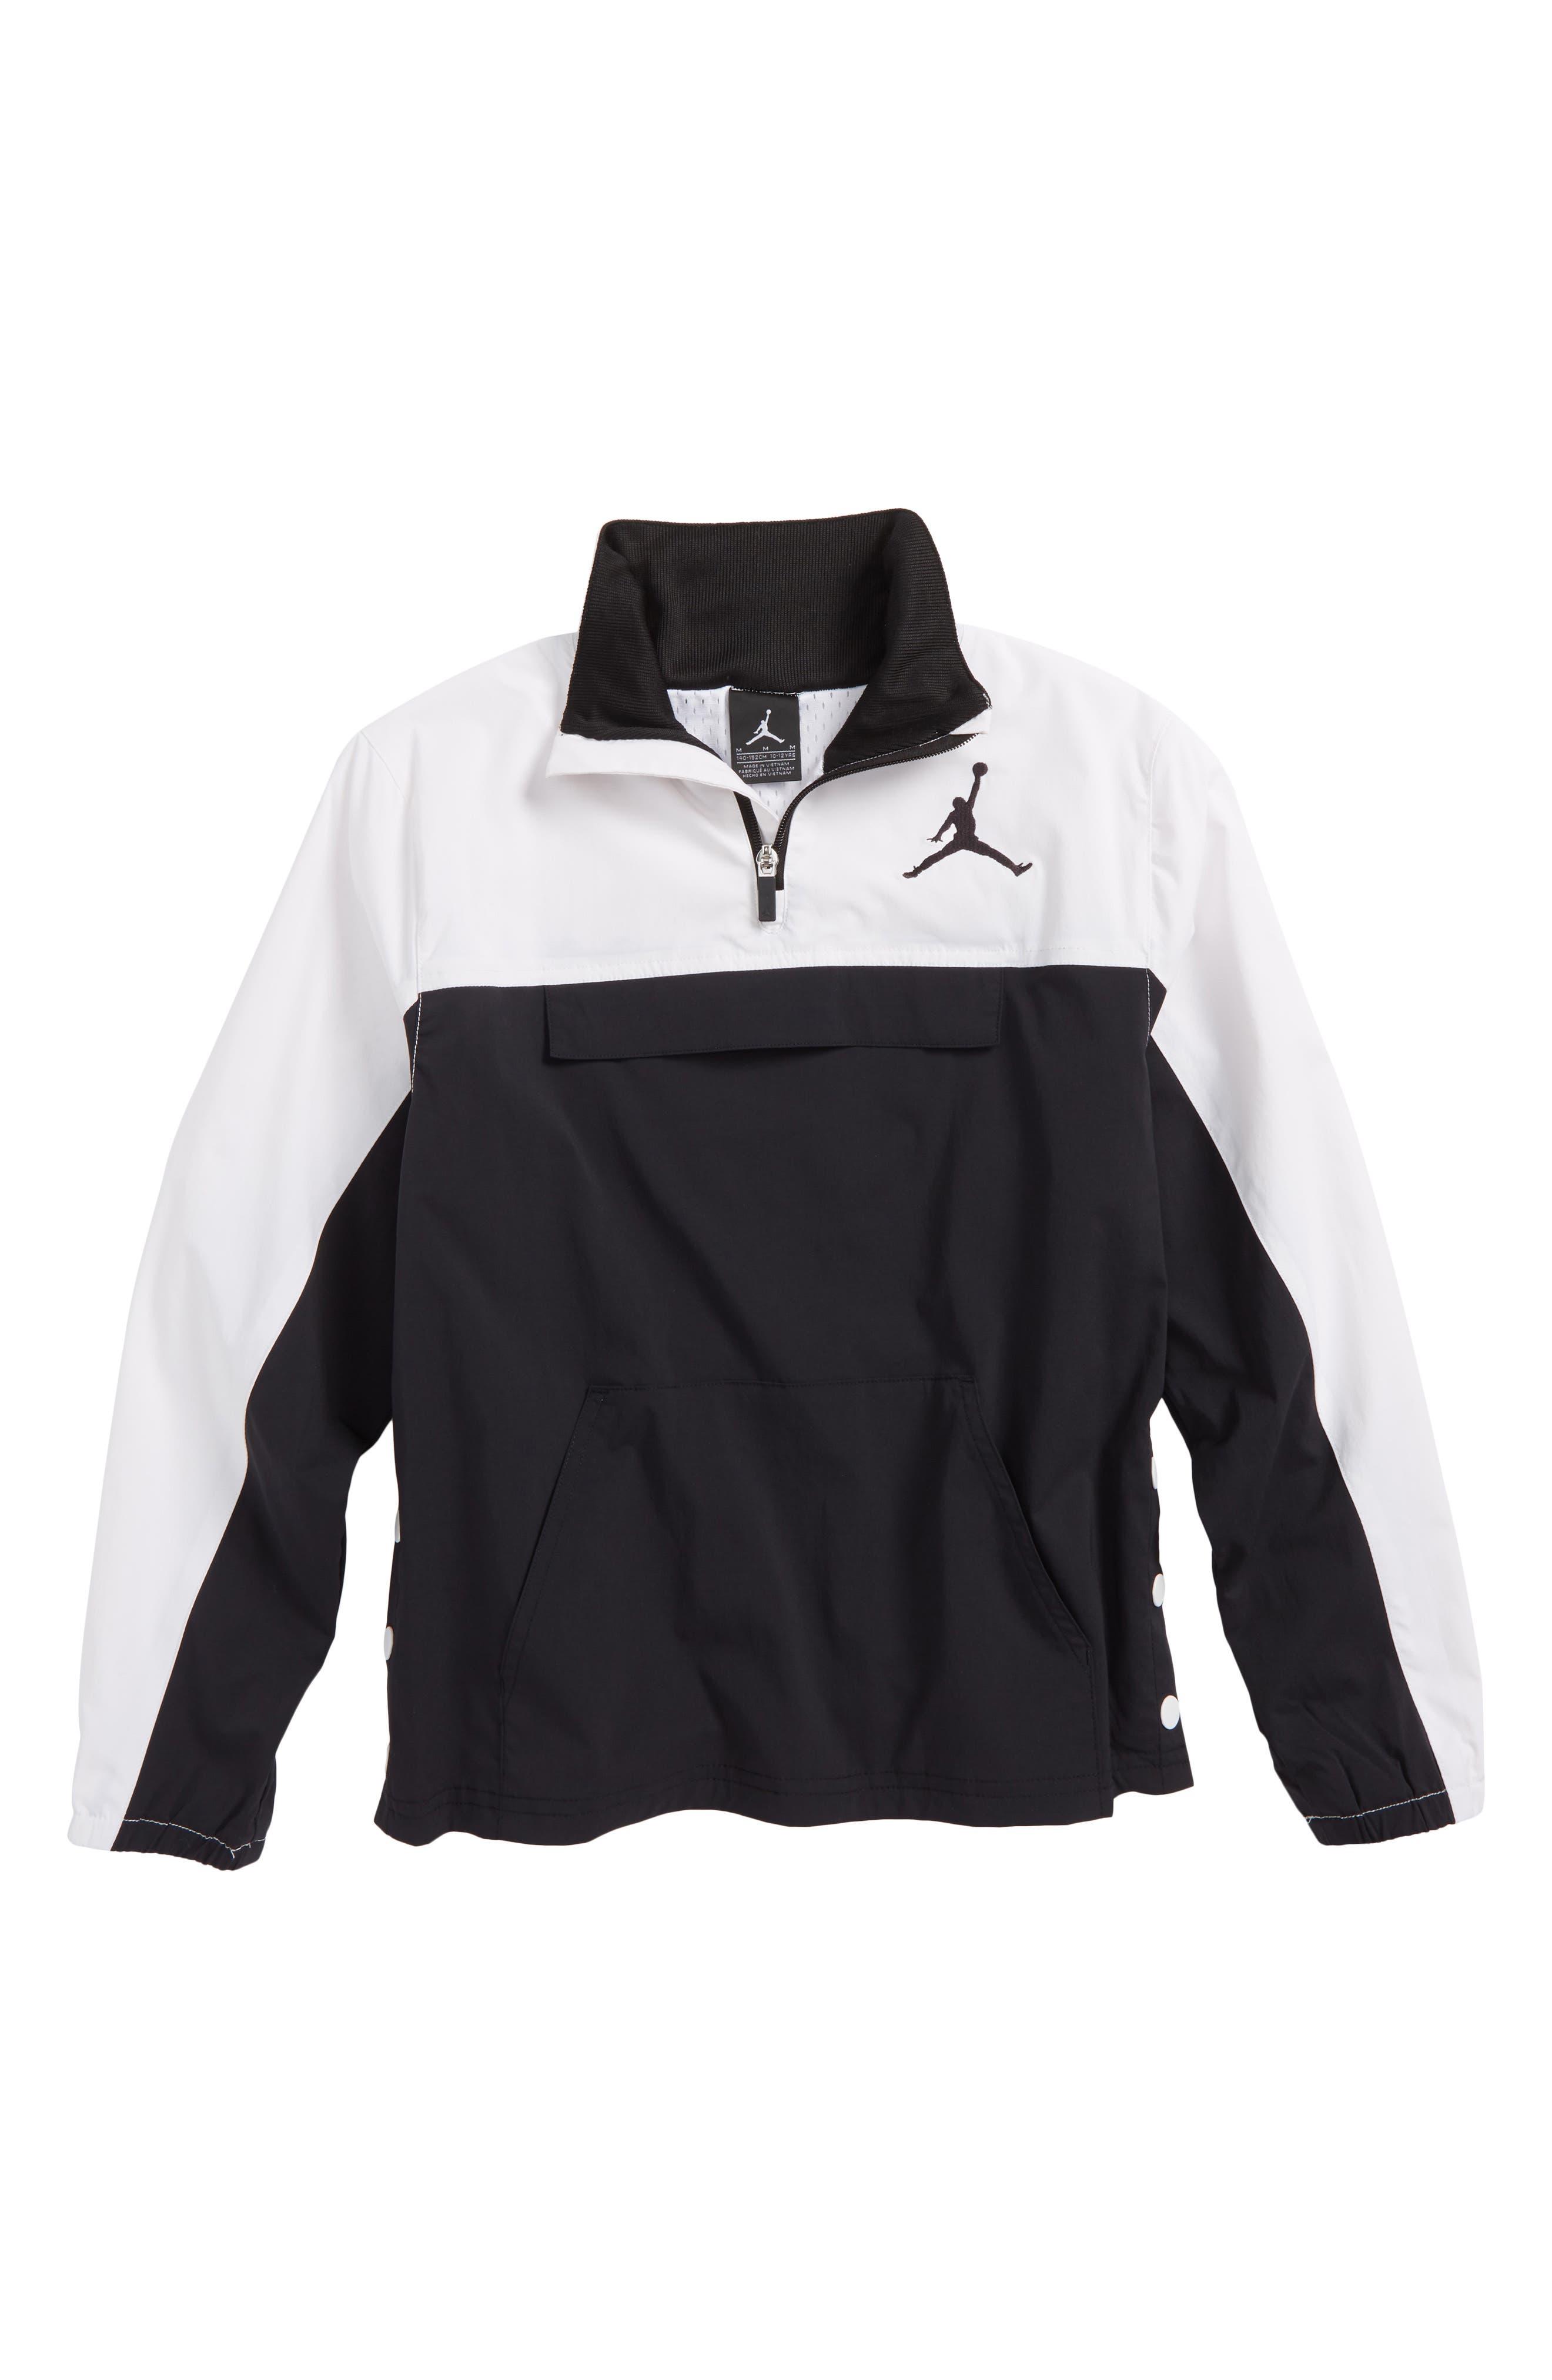 Jordan AJ '90s Popover Quarter Zip Pullover,                             Main thumbnail 1, color,                             001